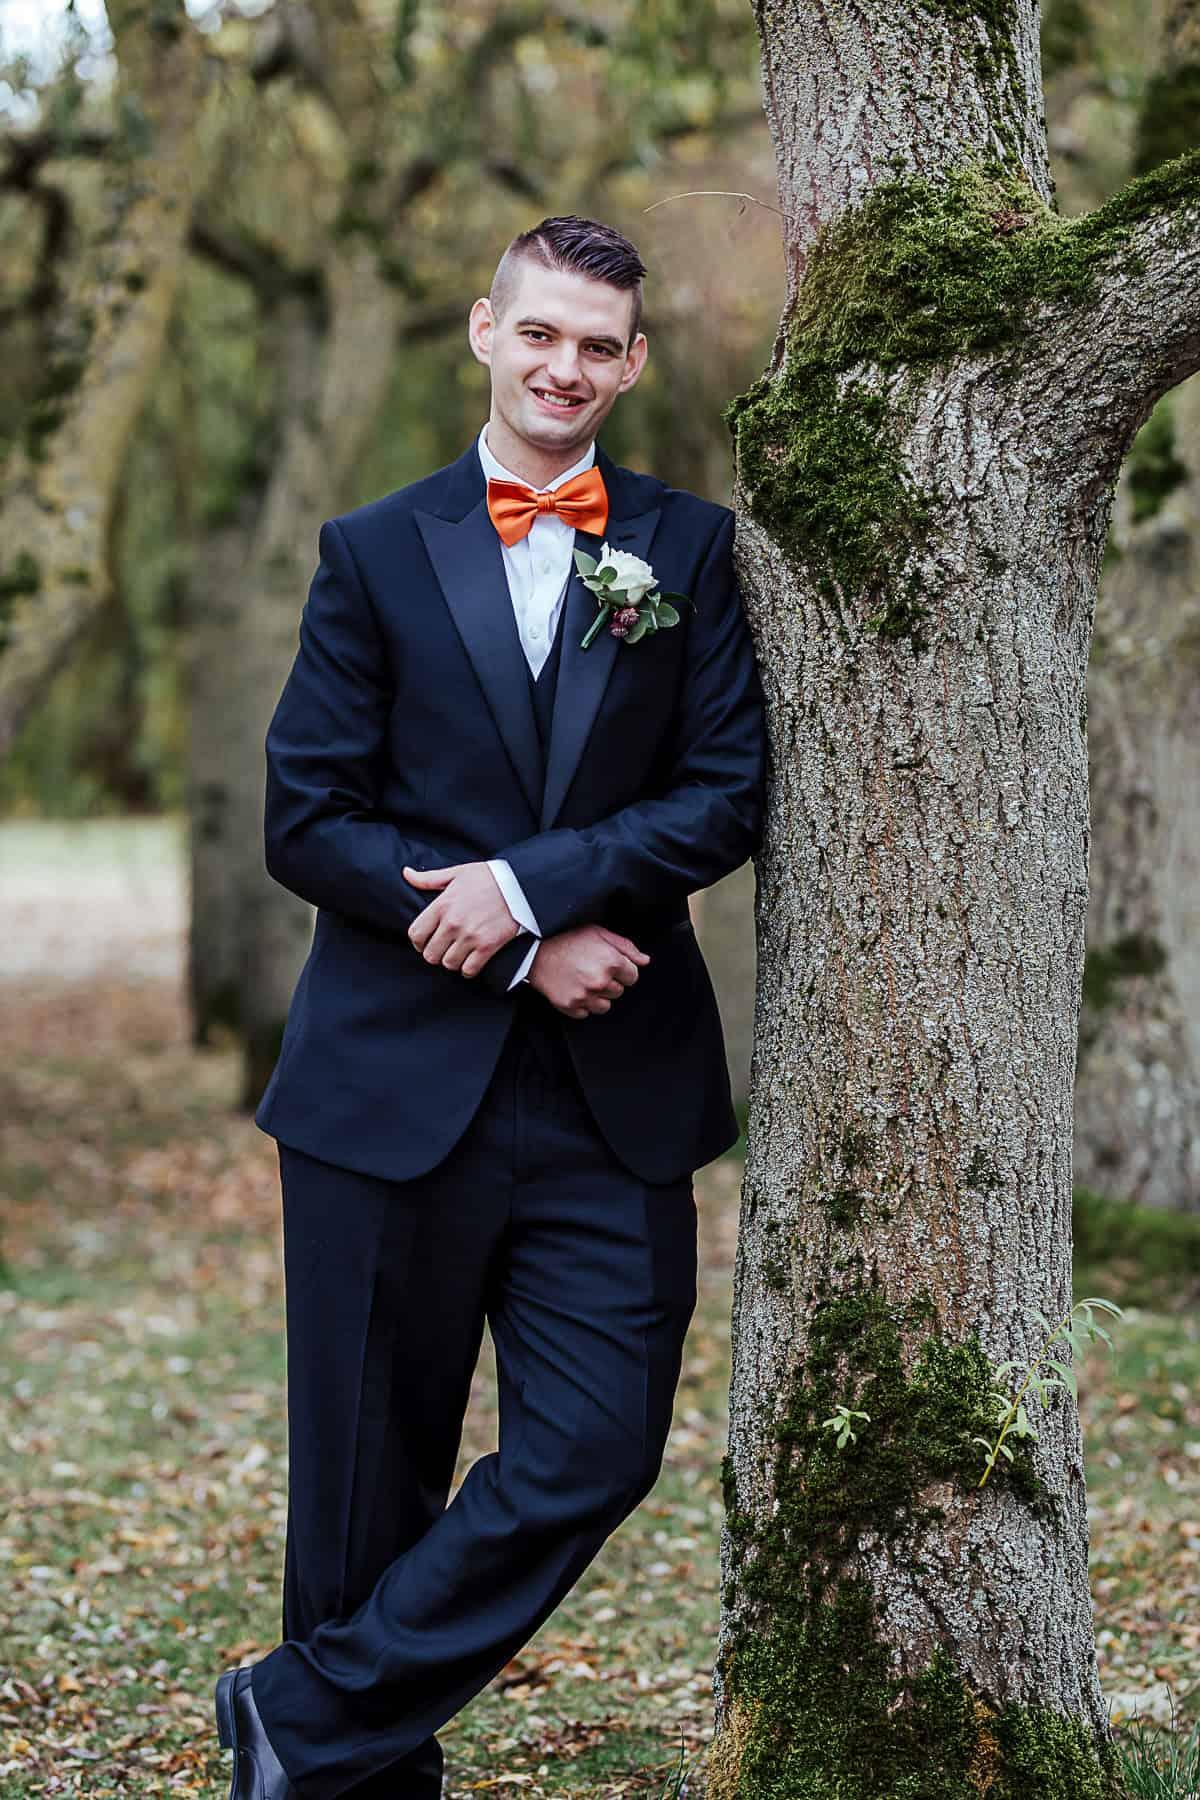 portrait of the groom fall wedding ideas